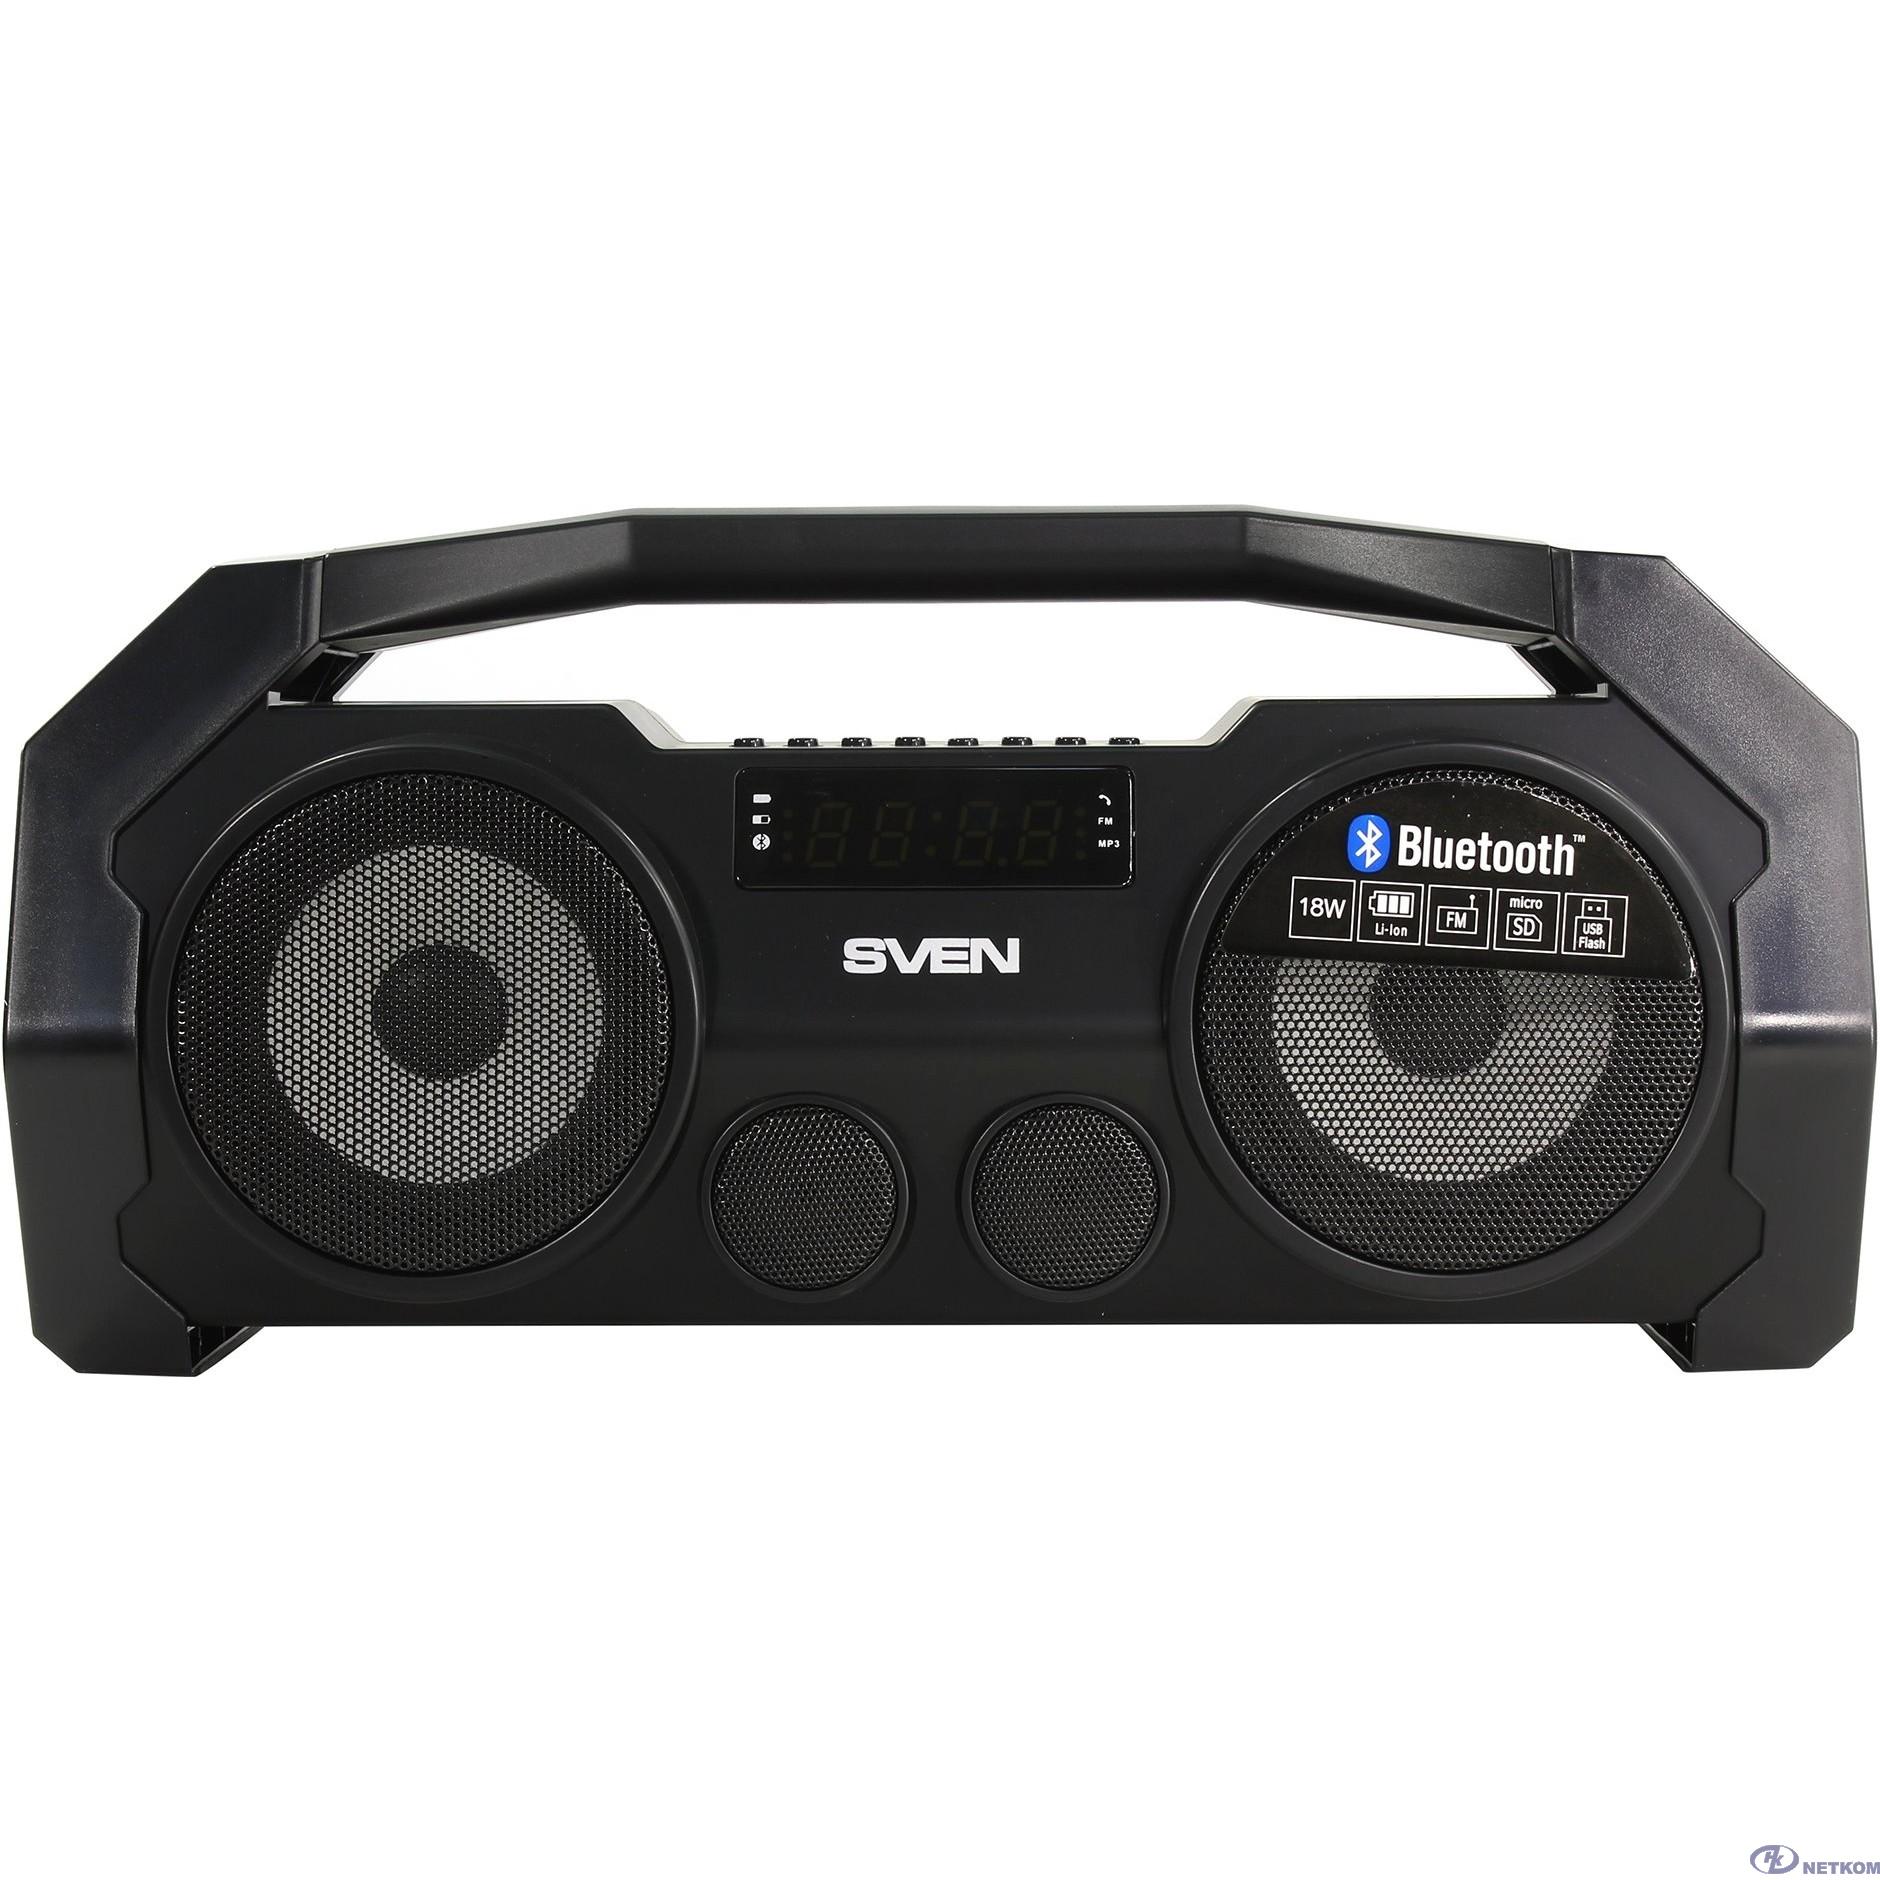 SVEN PS-465, черный (18 Вт, Bluetooth, FM, USB, microSD, LED-дисплей, 1800мА*ч)